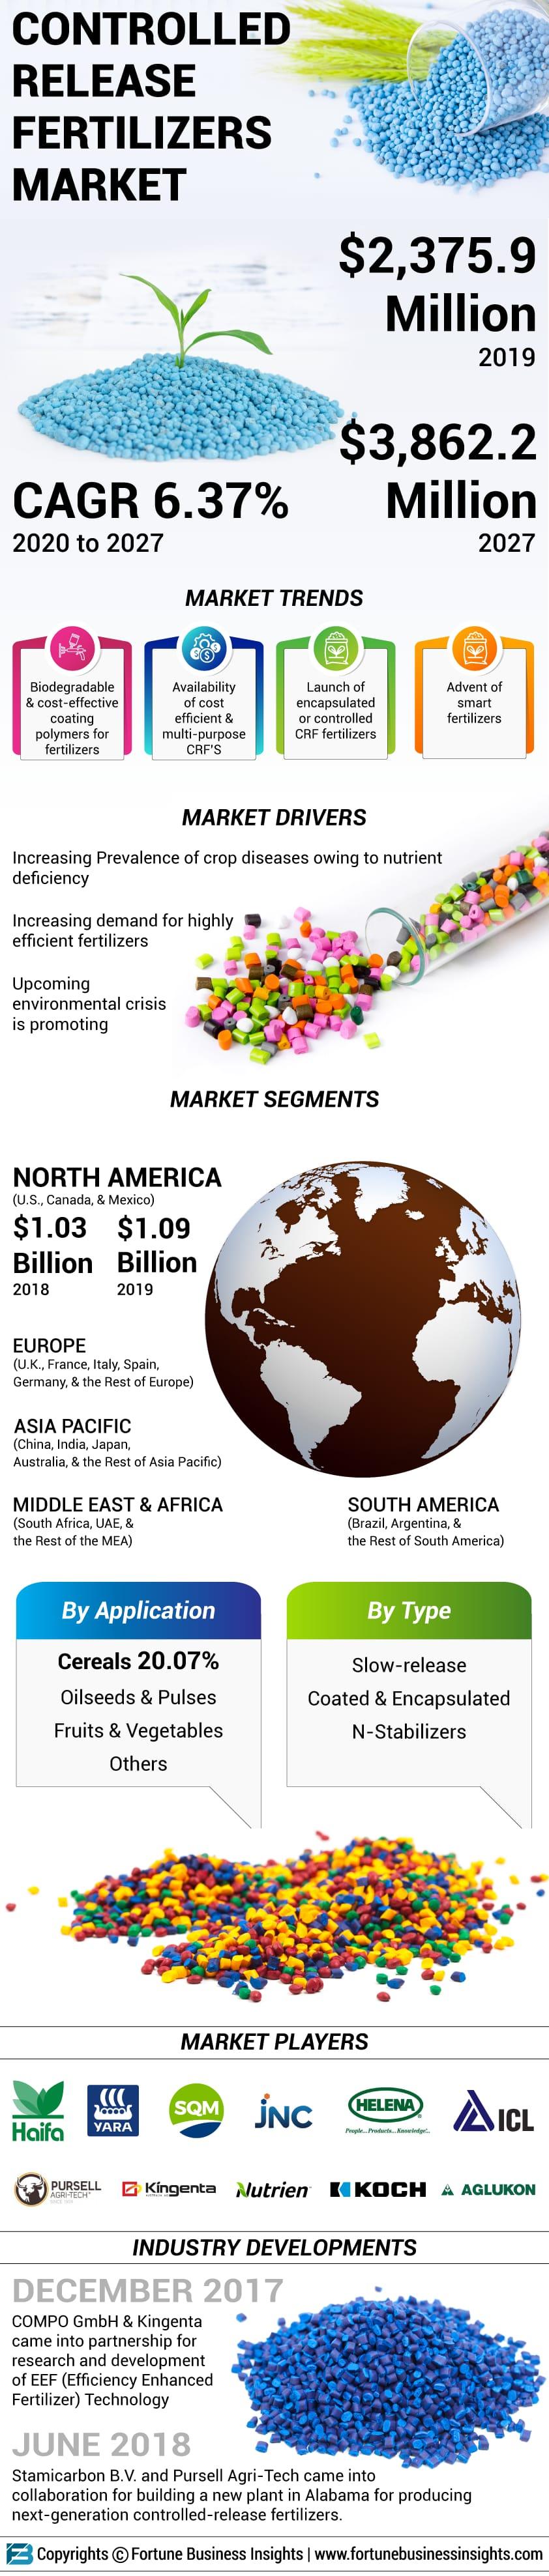 Controlled Release Fertilizers (CRF) Market